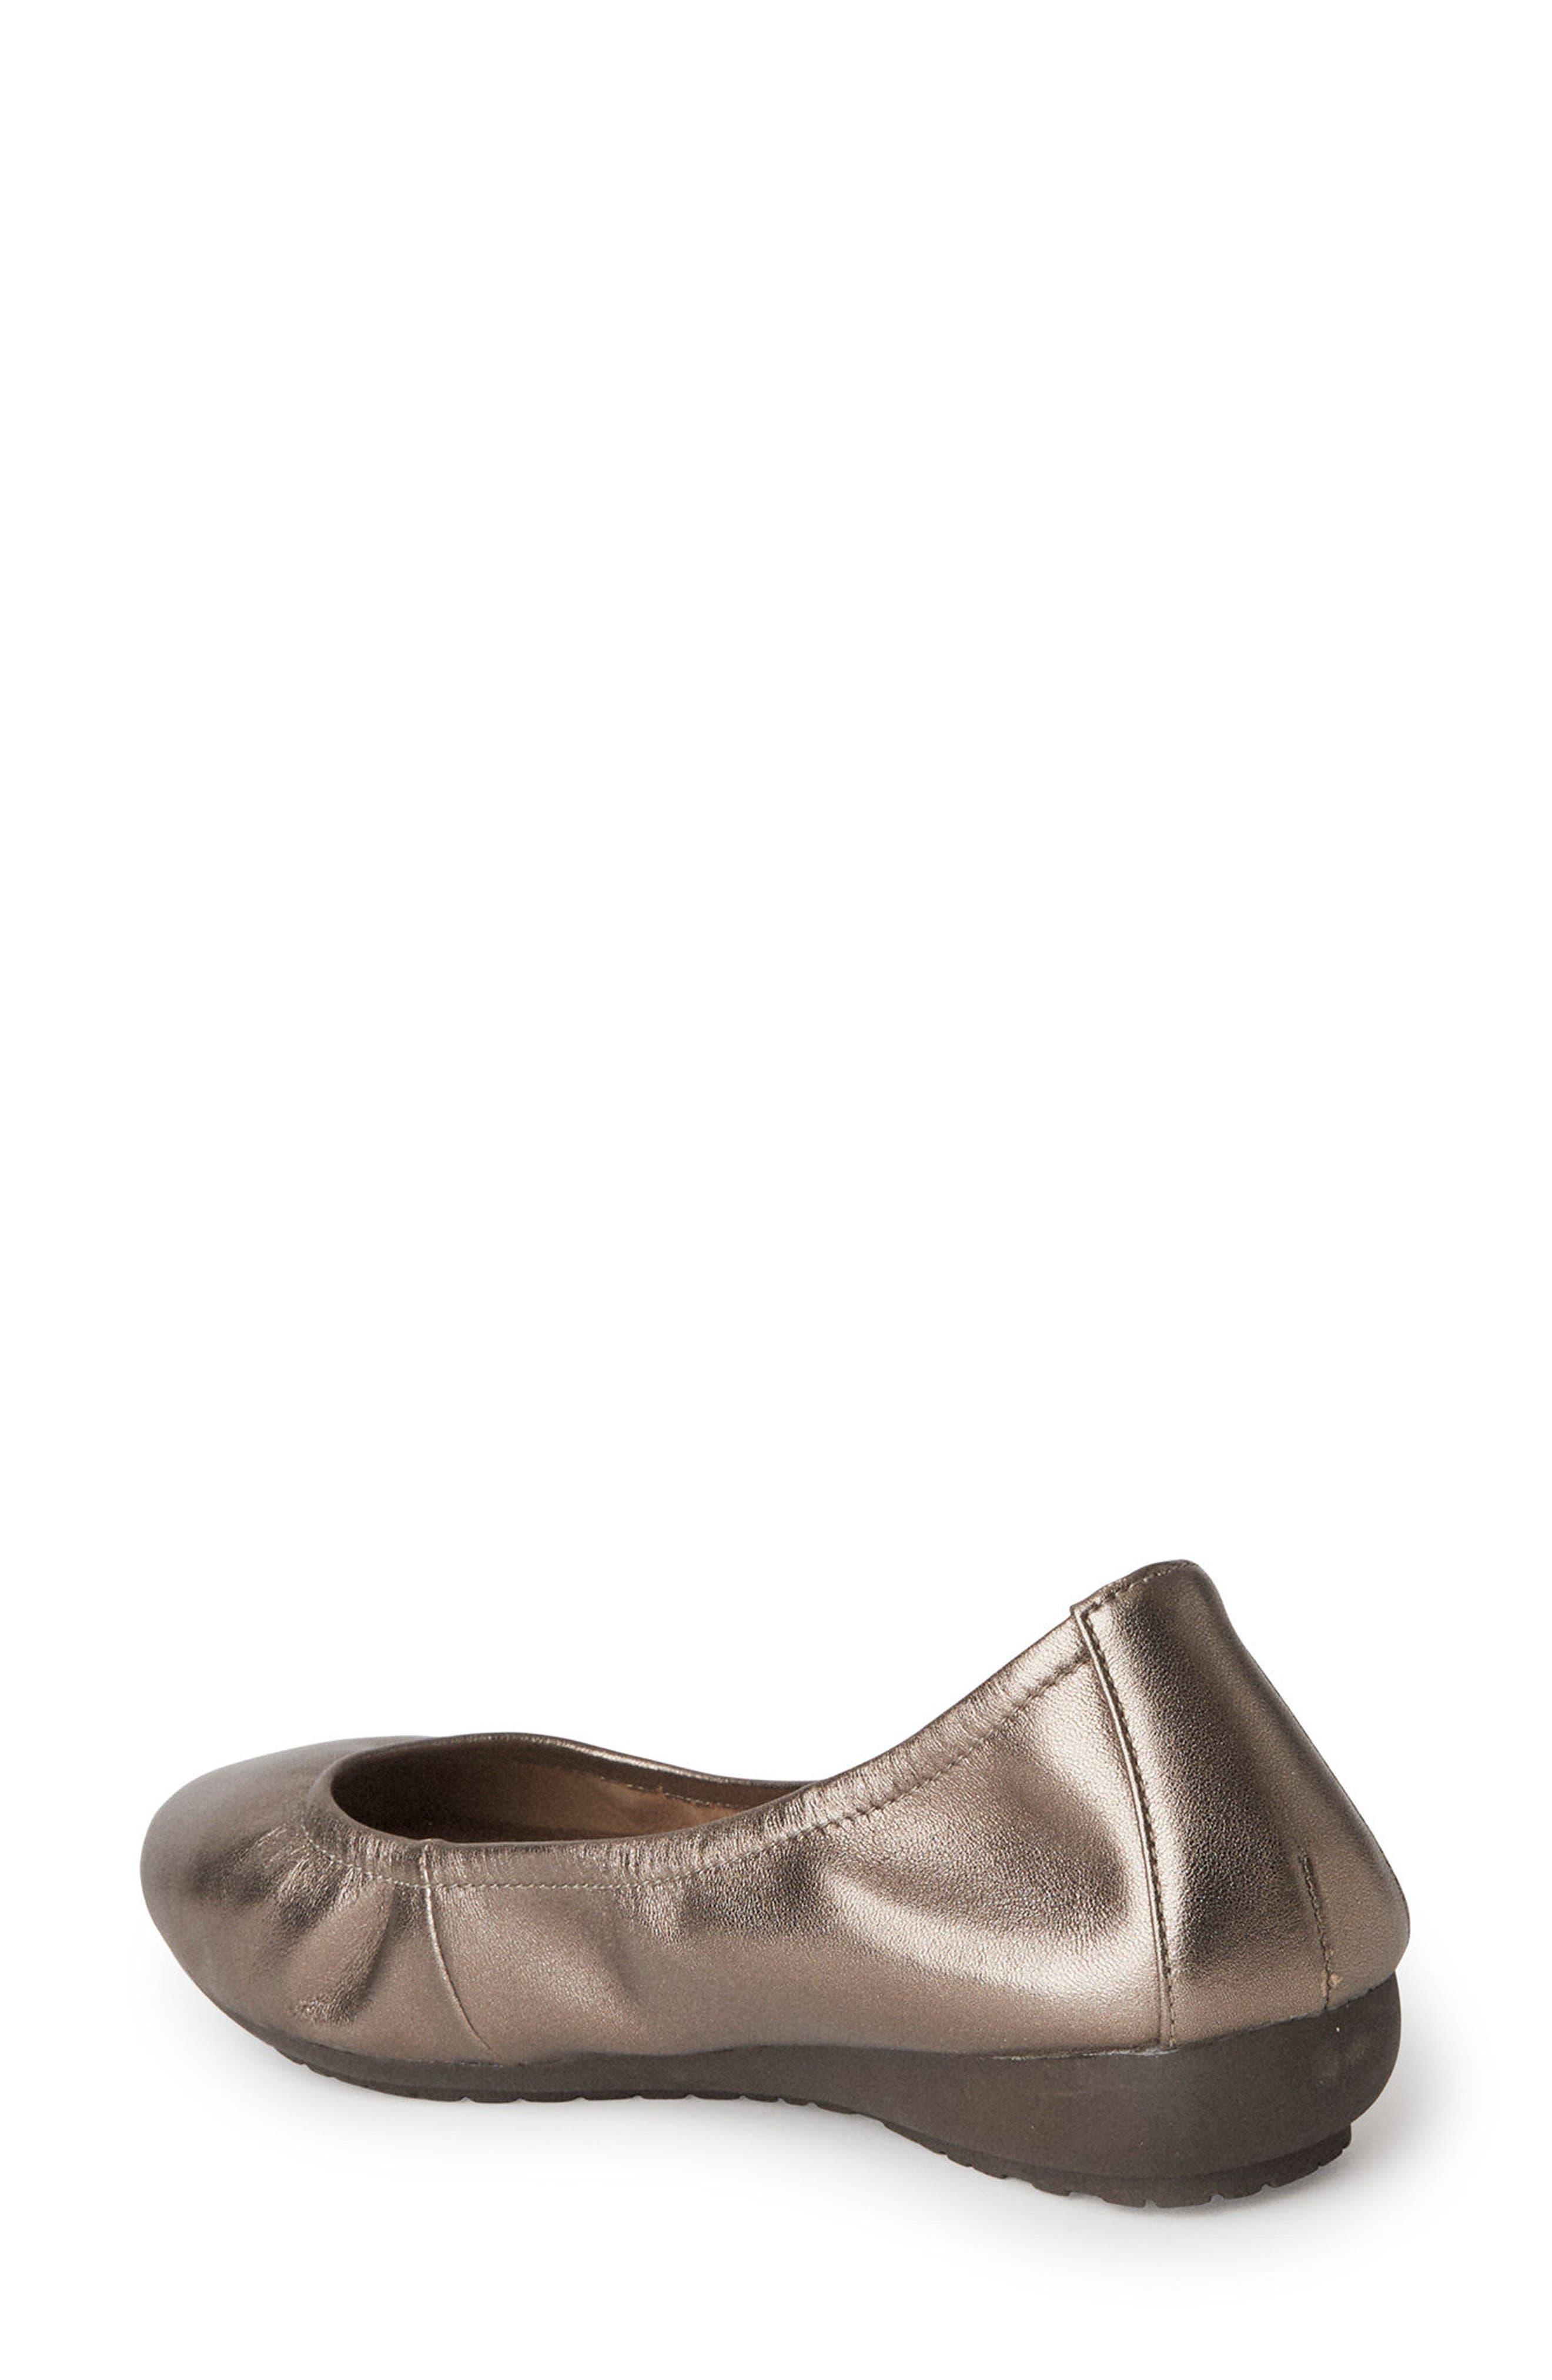 Janell Sliver Wedge Flat,                             Alternate thumbnail 2, color,                             Mink Metallic Leather